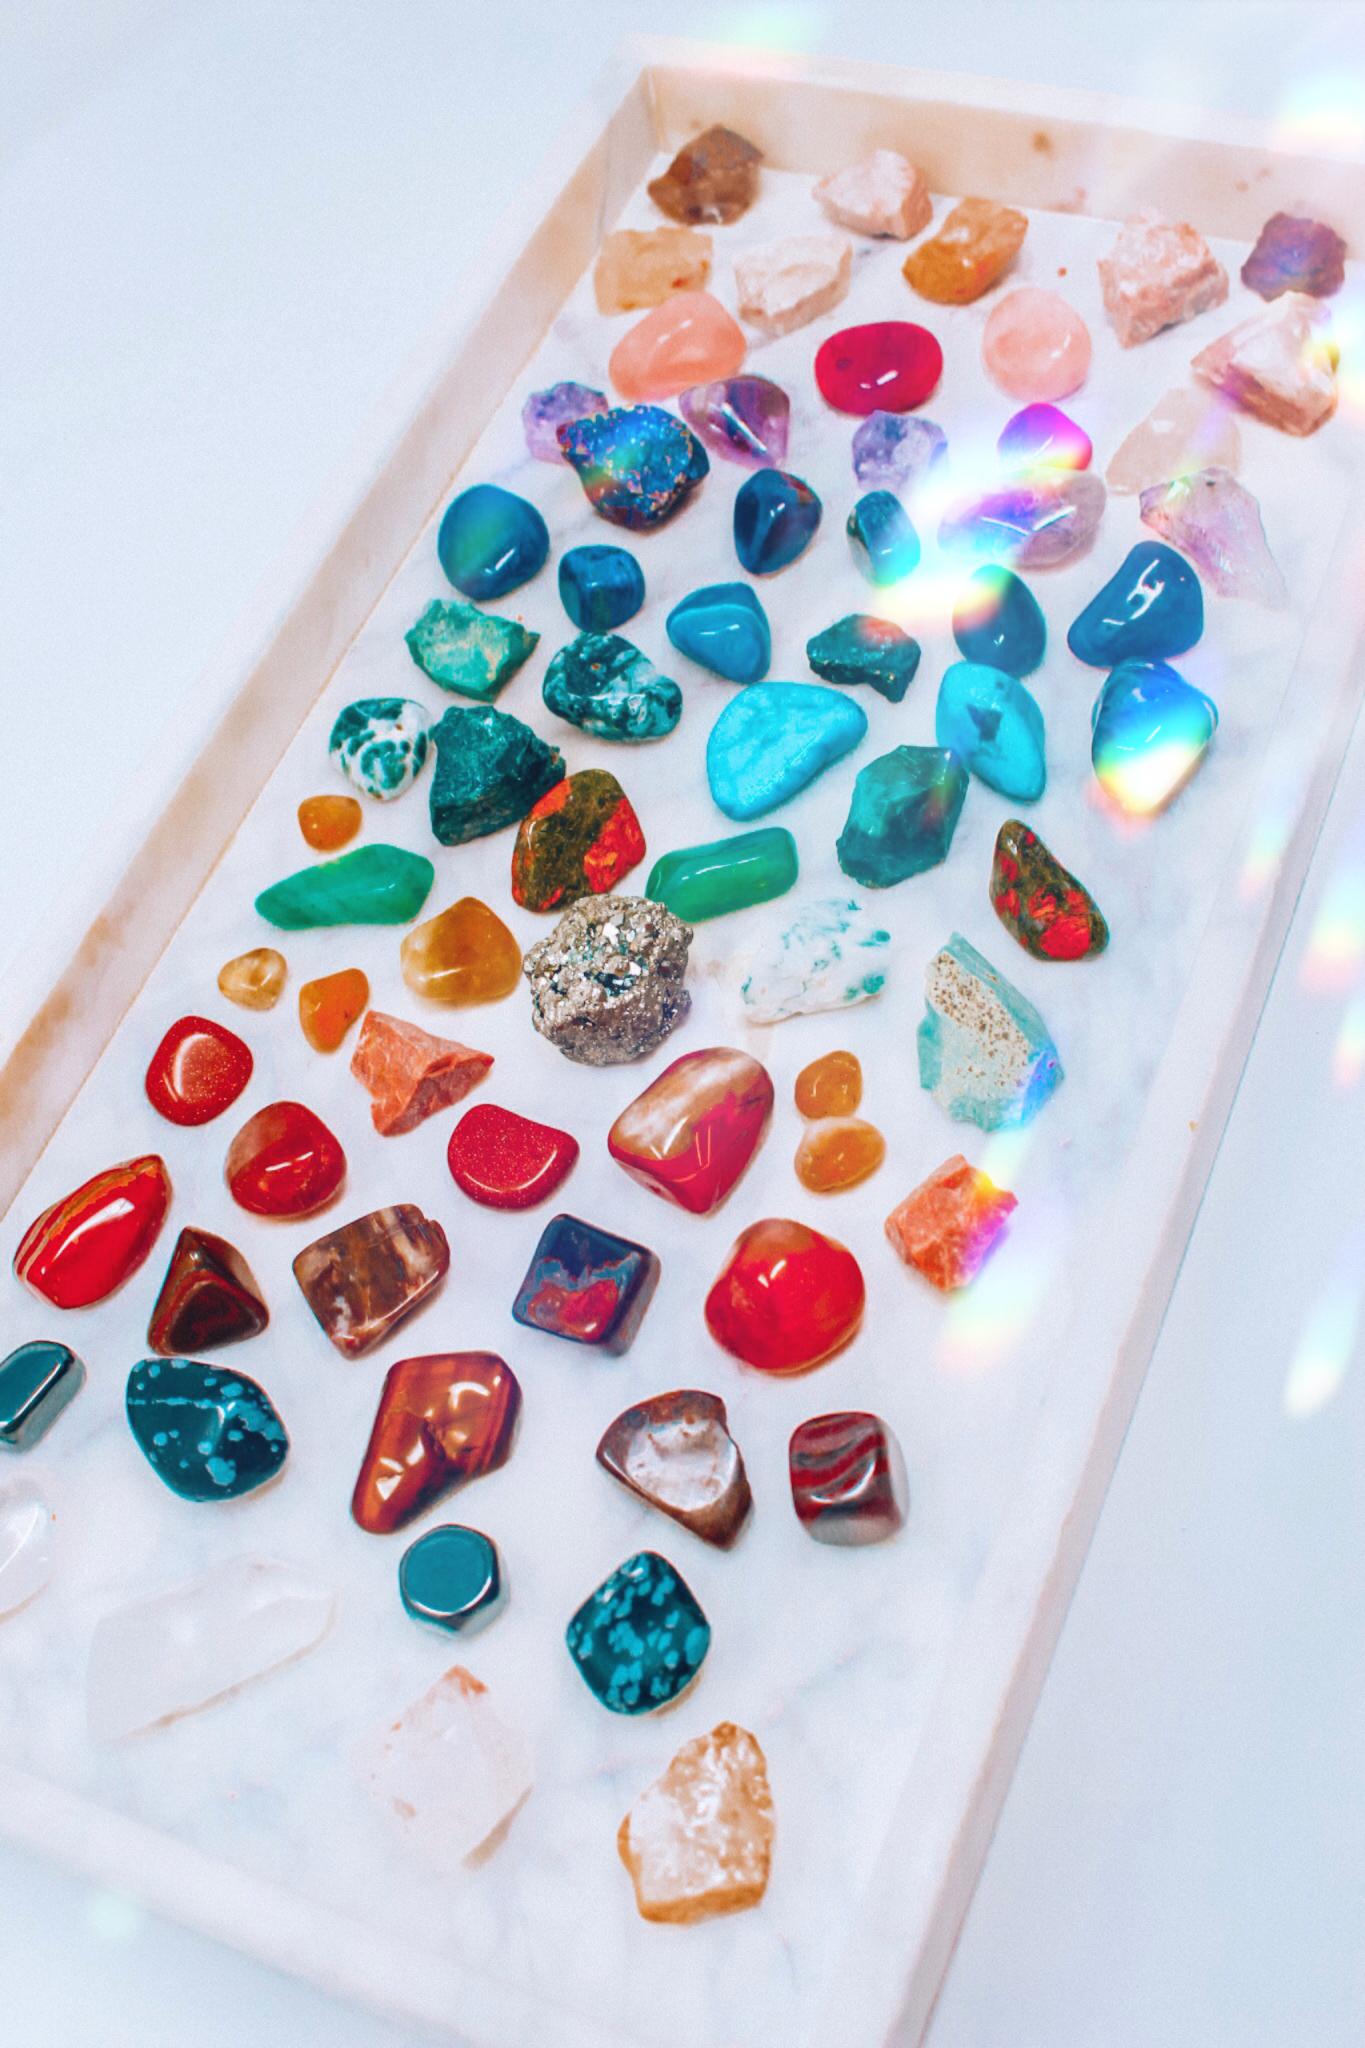 Spirit Stones Stone Crystals Healing Grids Raw Crystal Decor